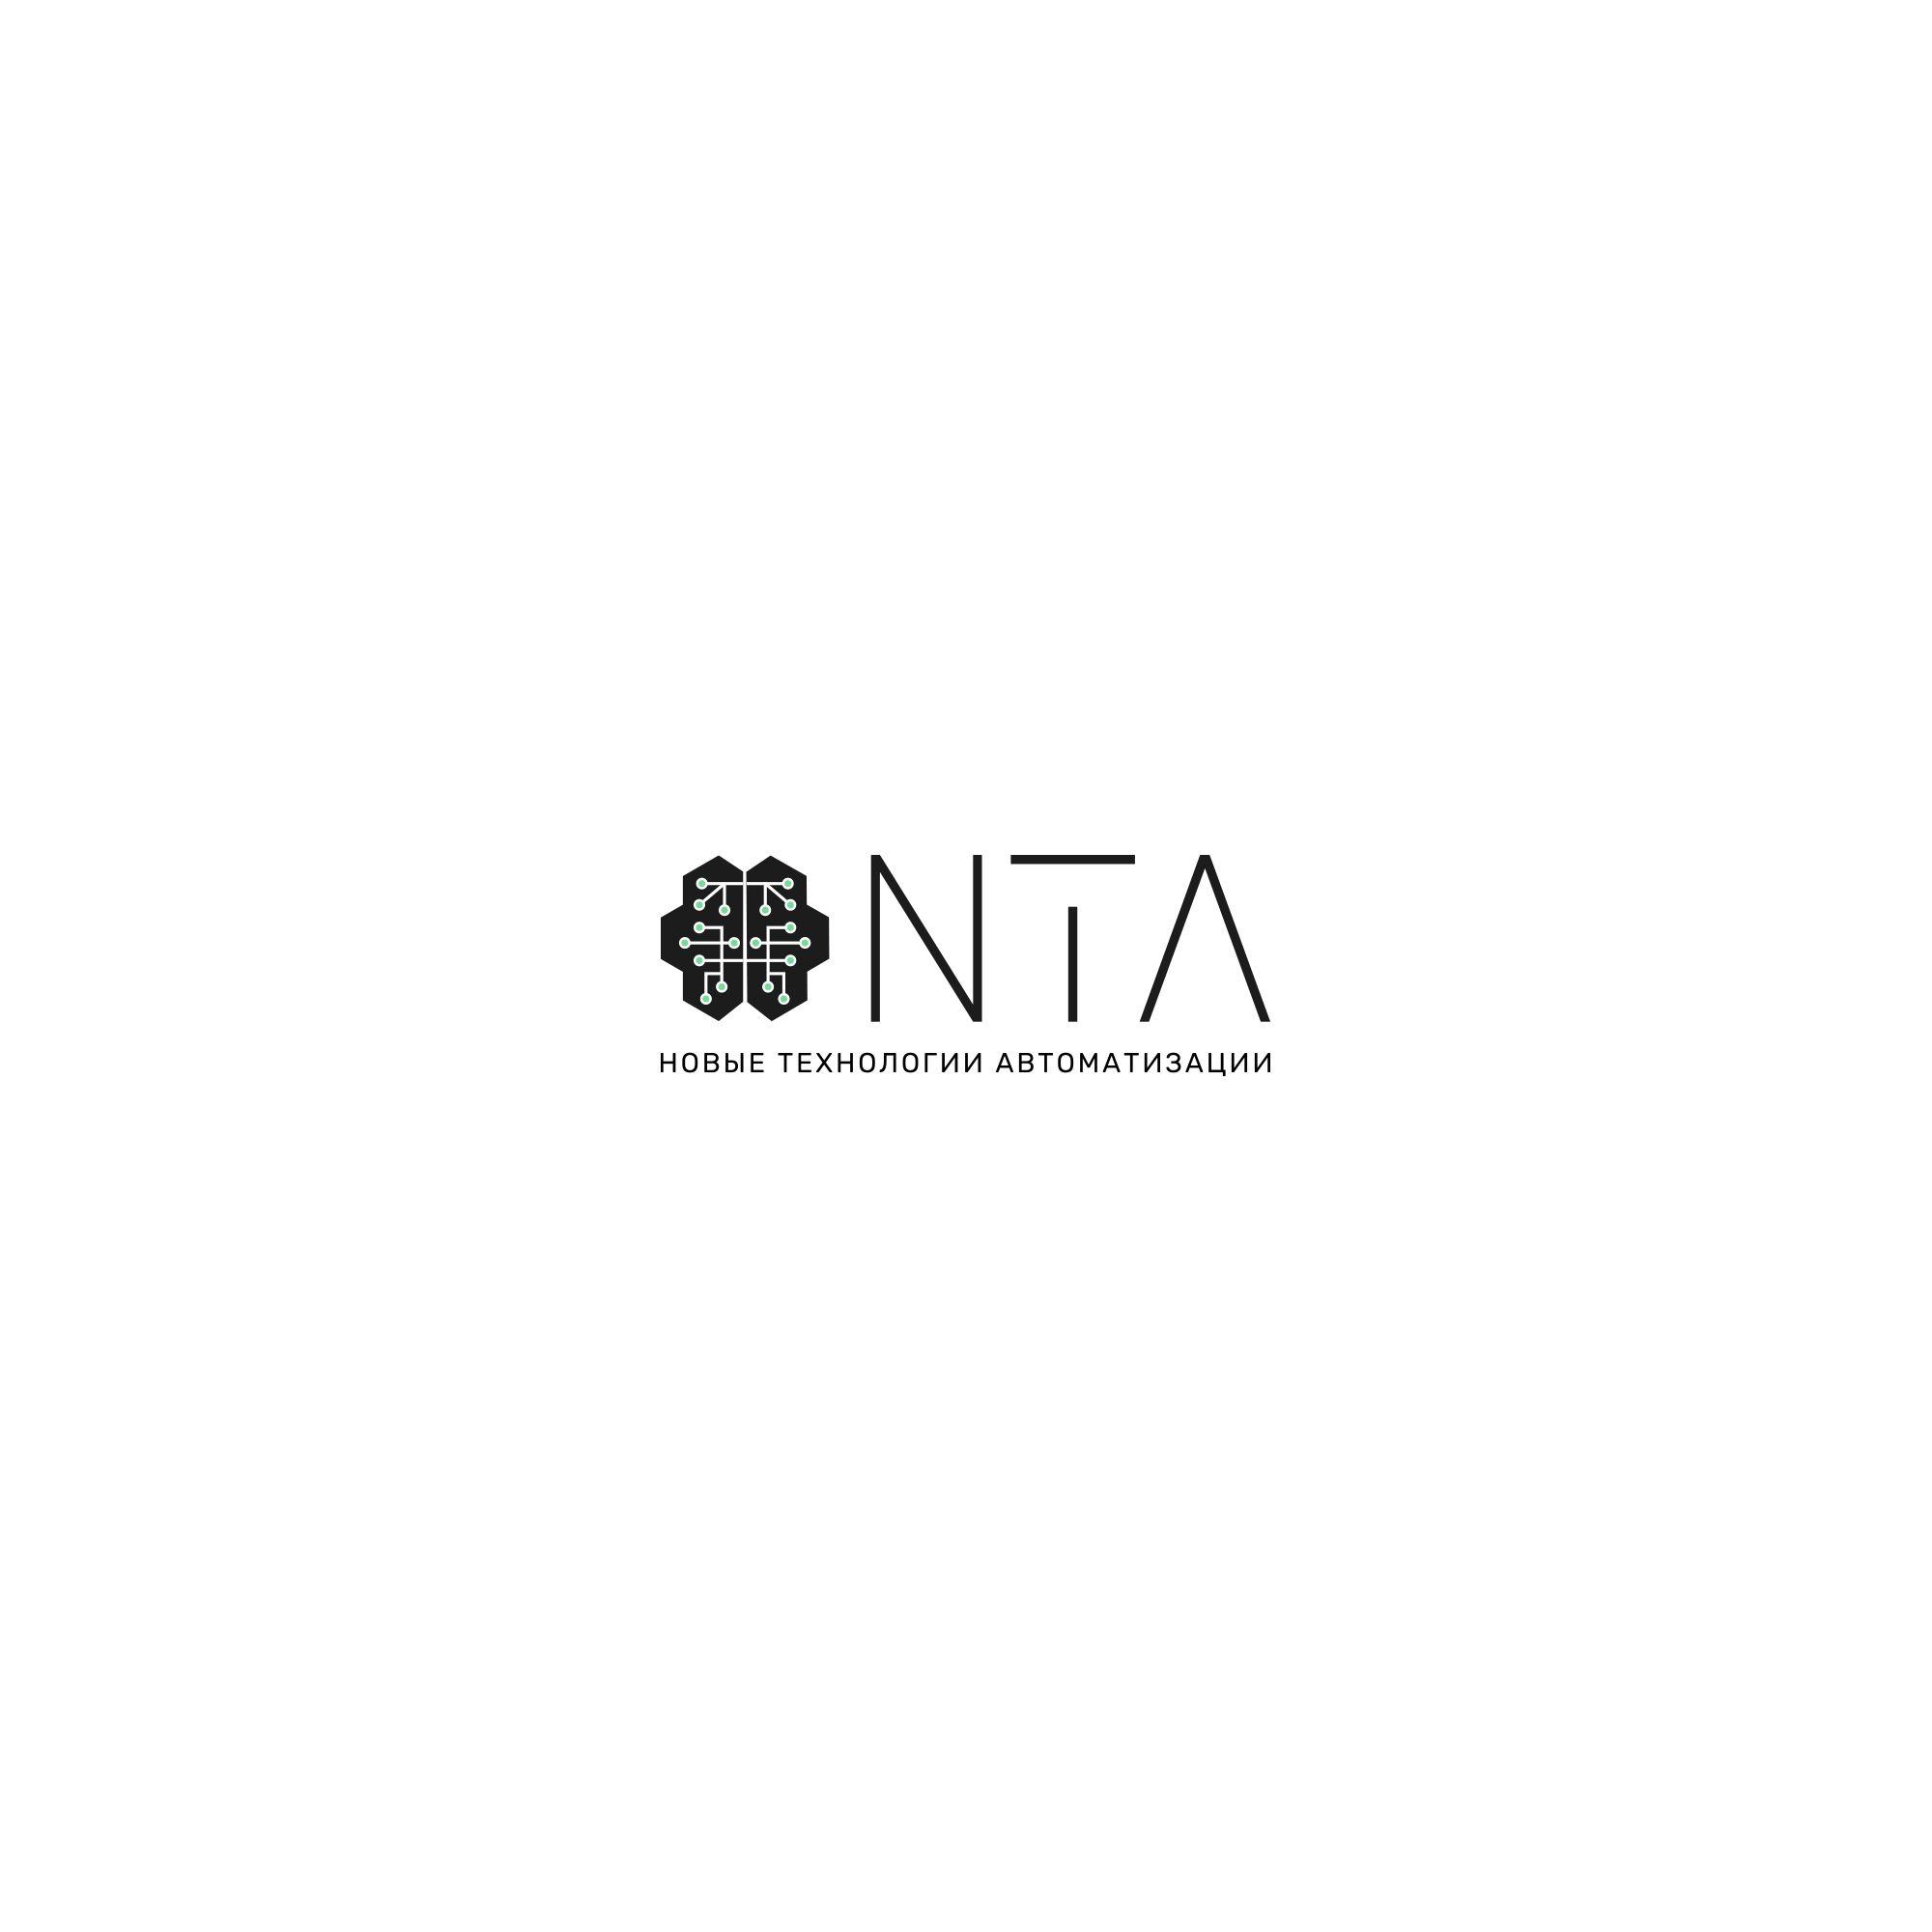 Логотип для НТА - дизайнер Vebjorn